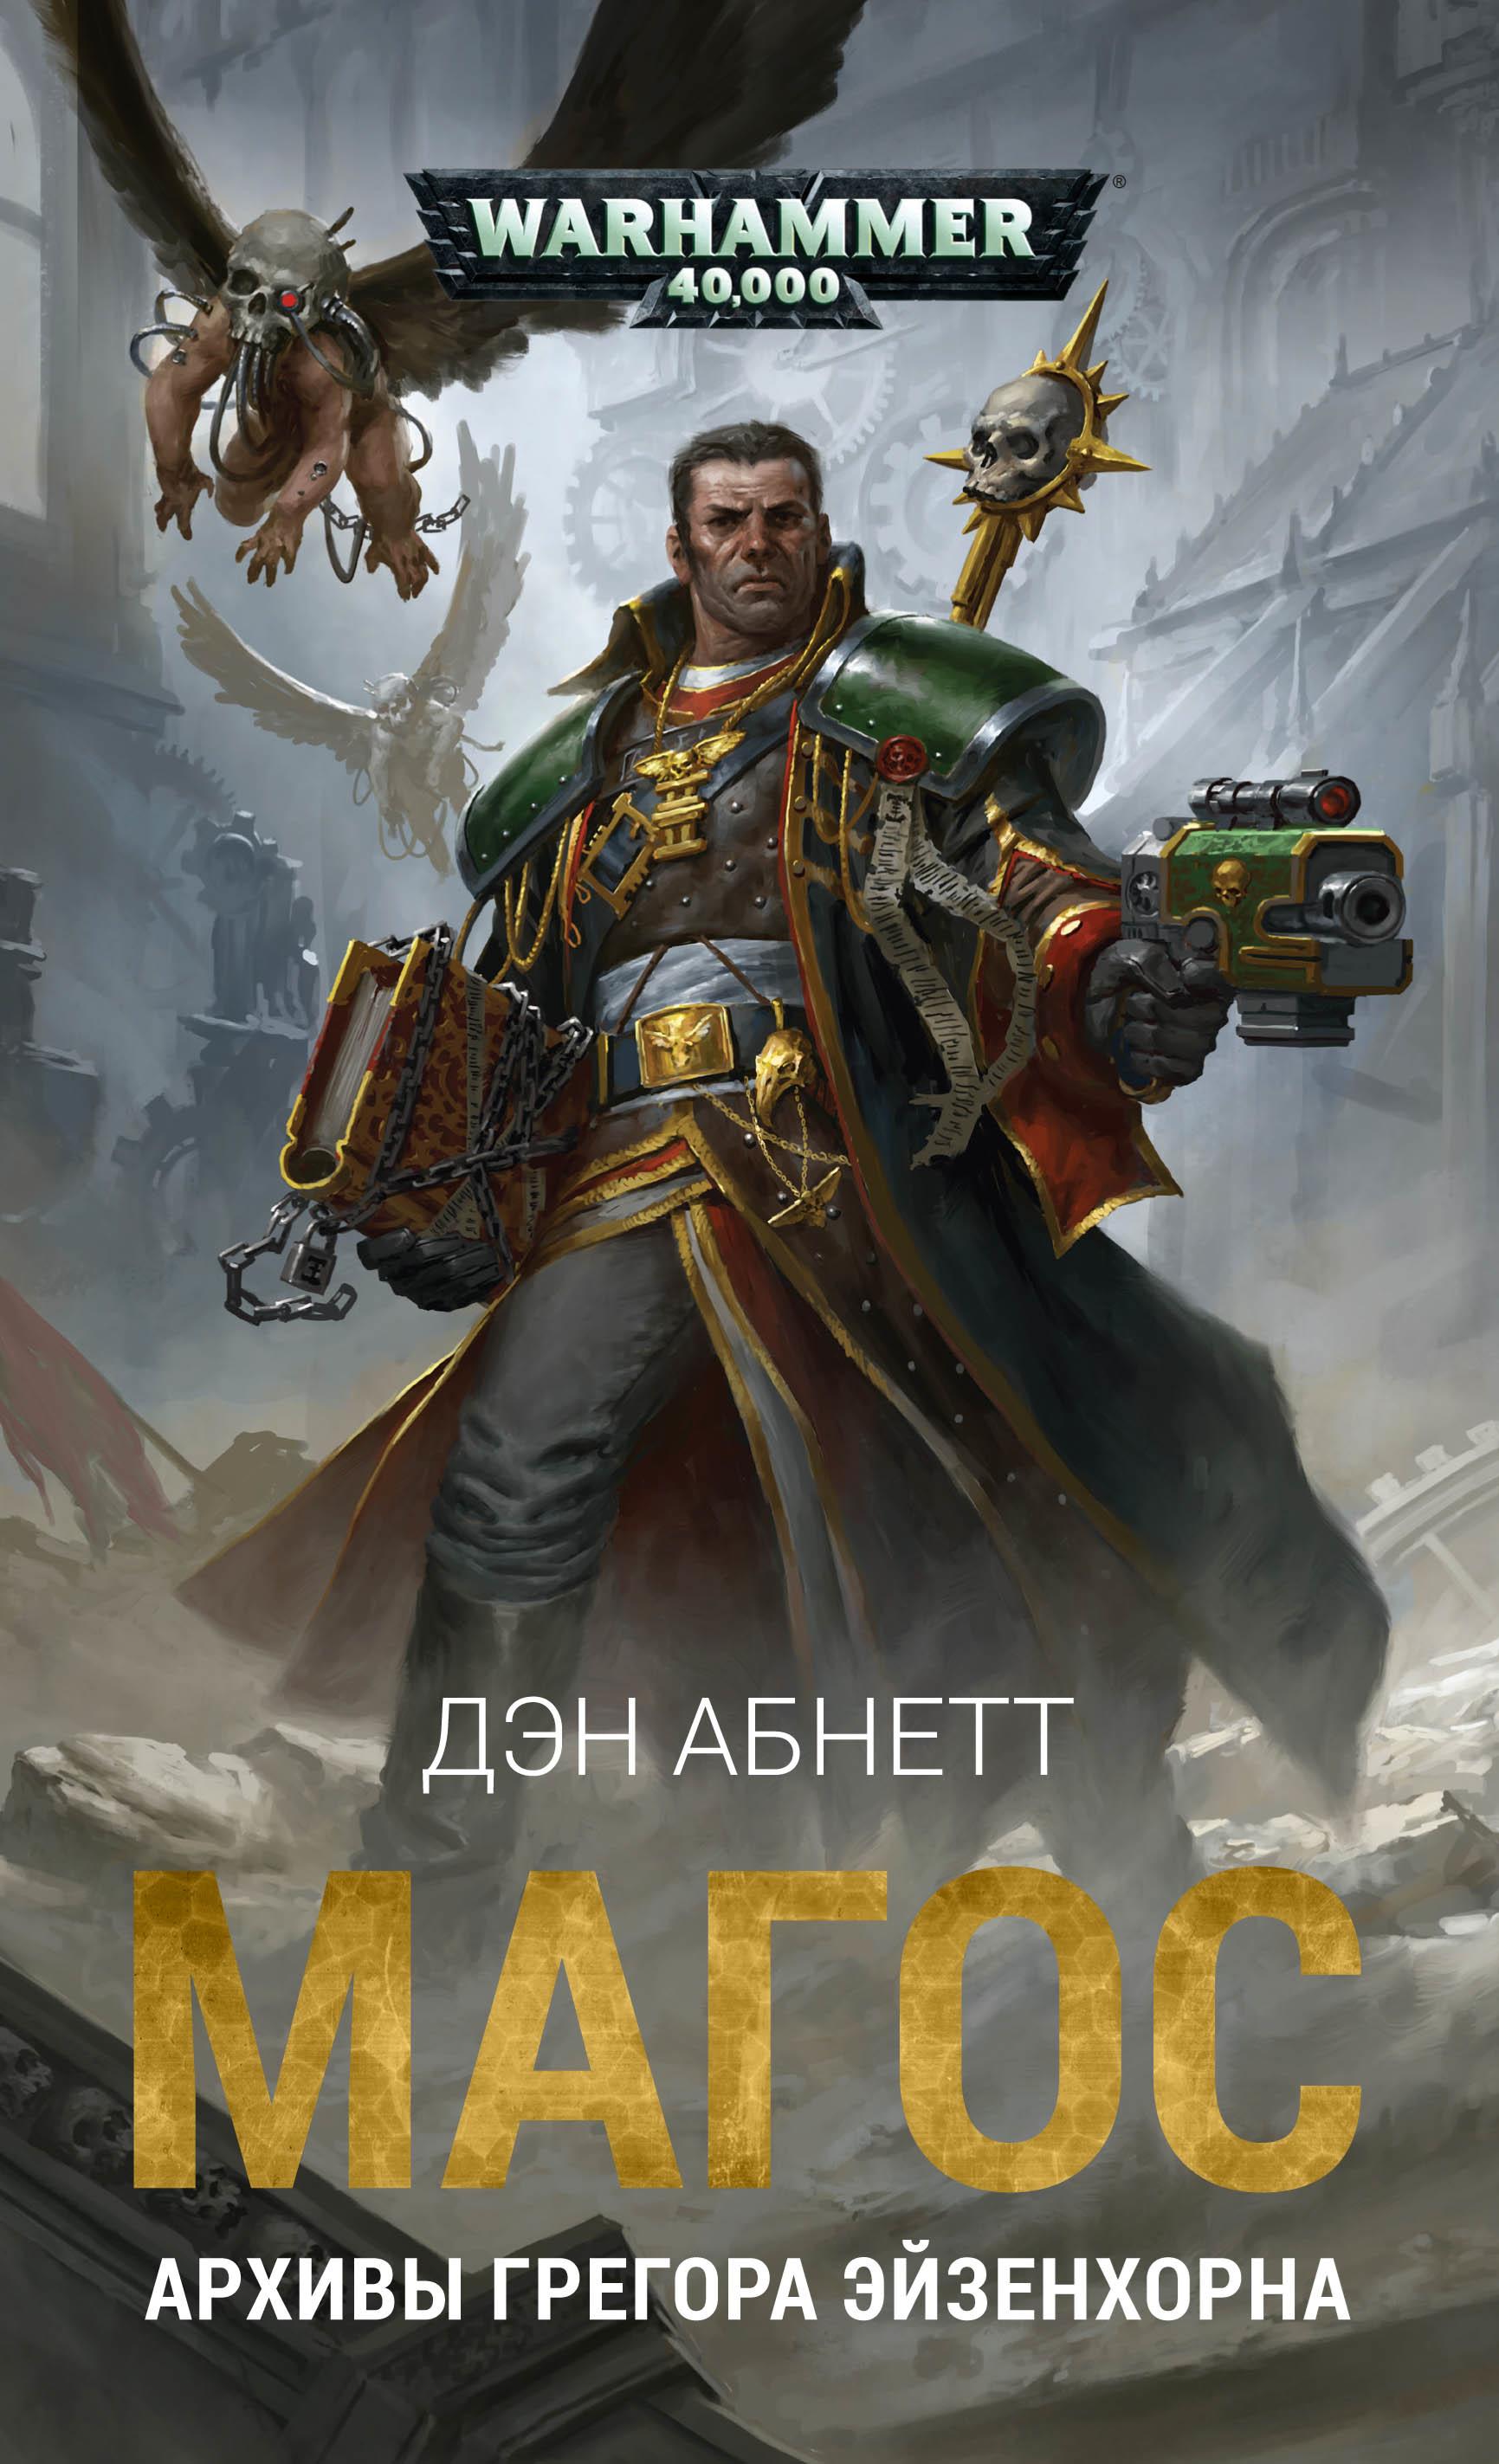 Warhammer 40 000: Магос – Архивы Грегора Эйзенхорна фото